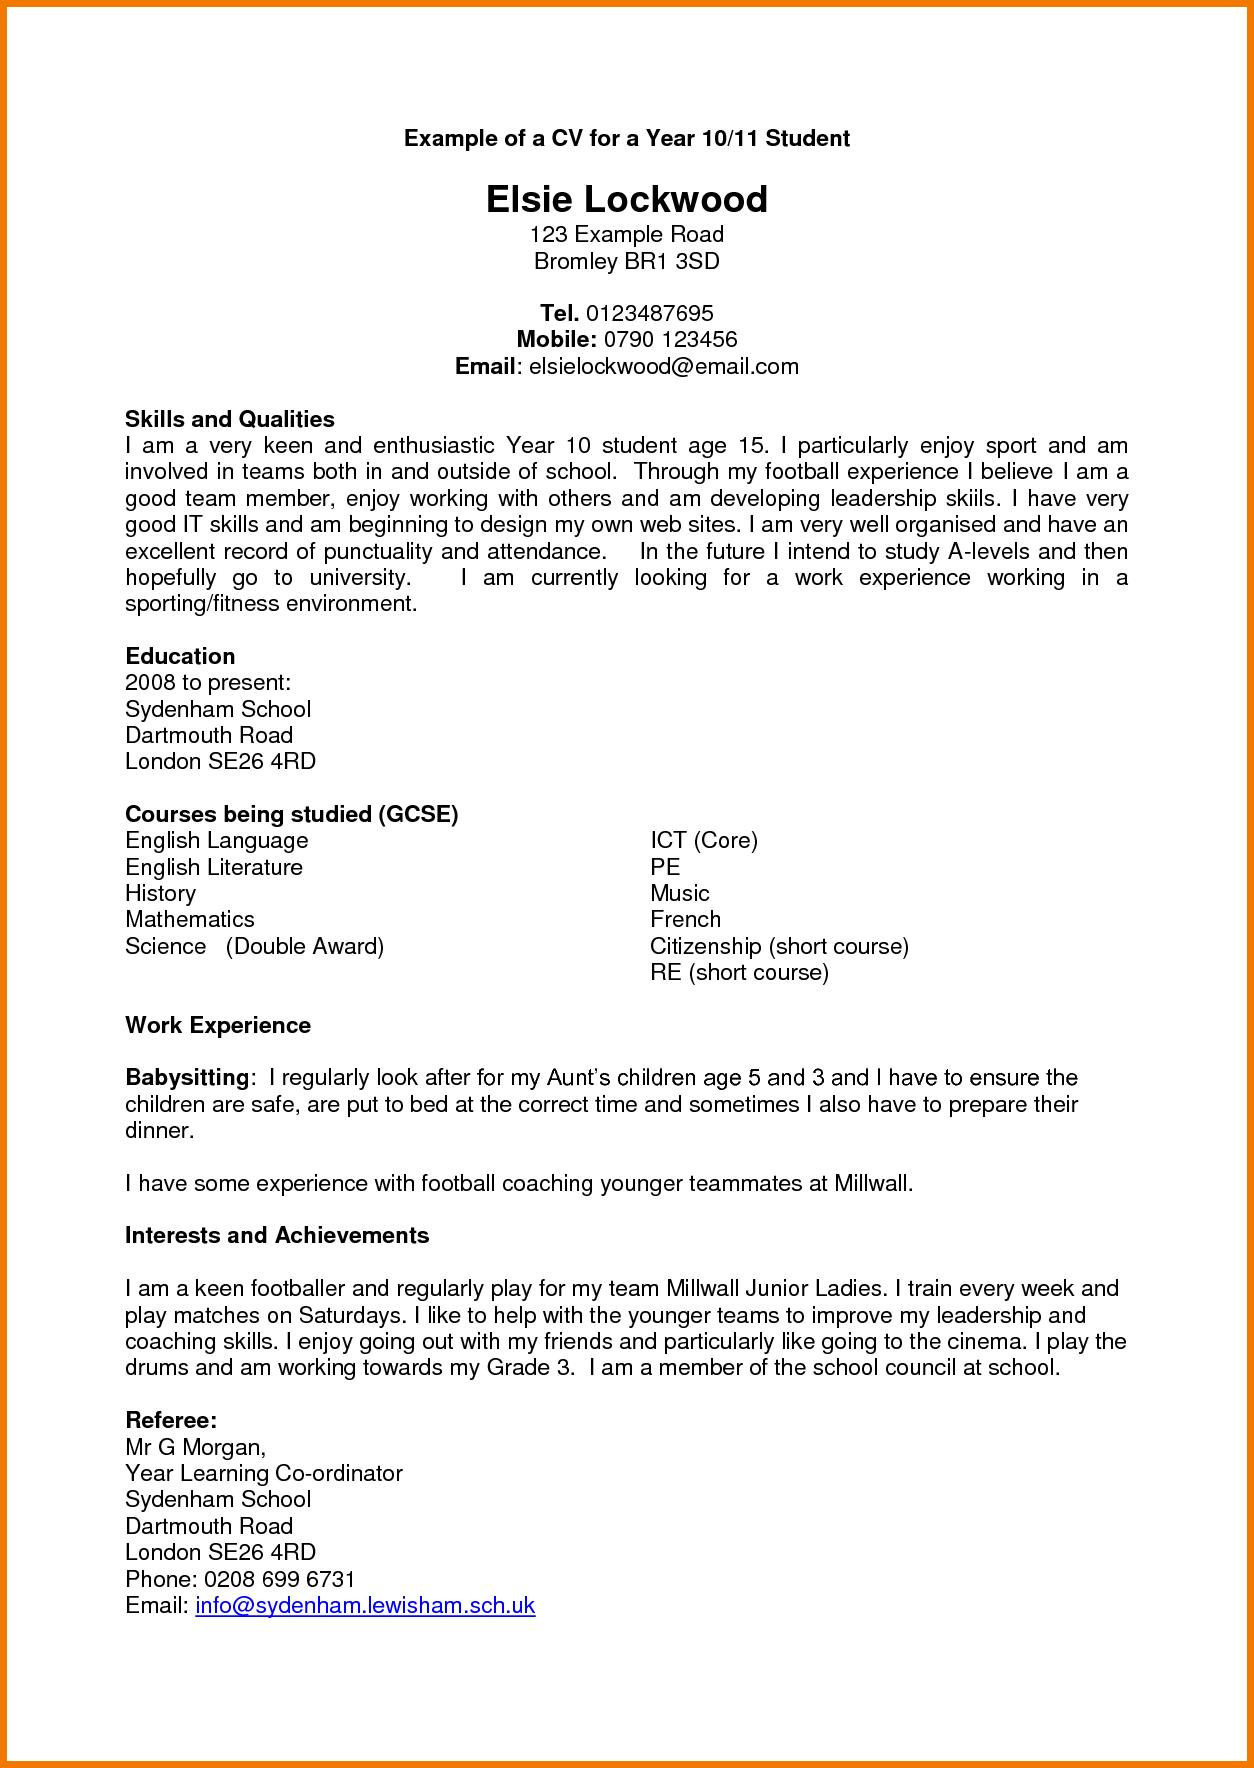 Free resume writing help online